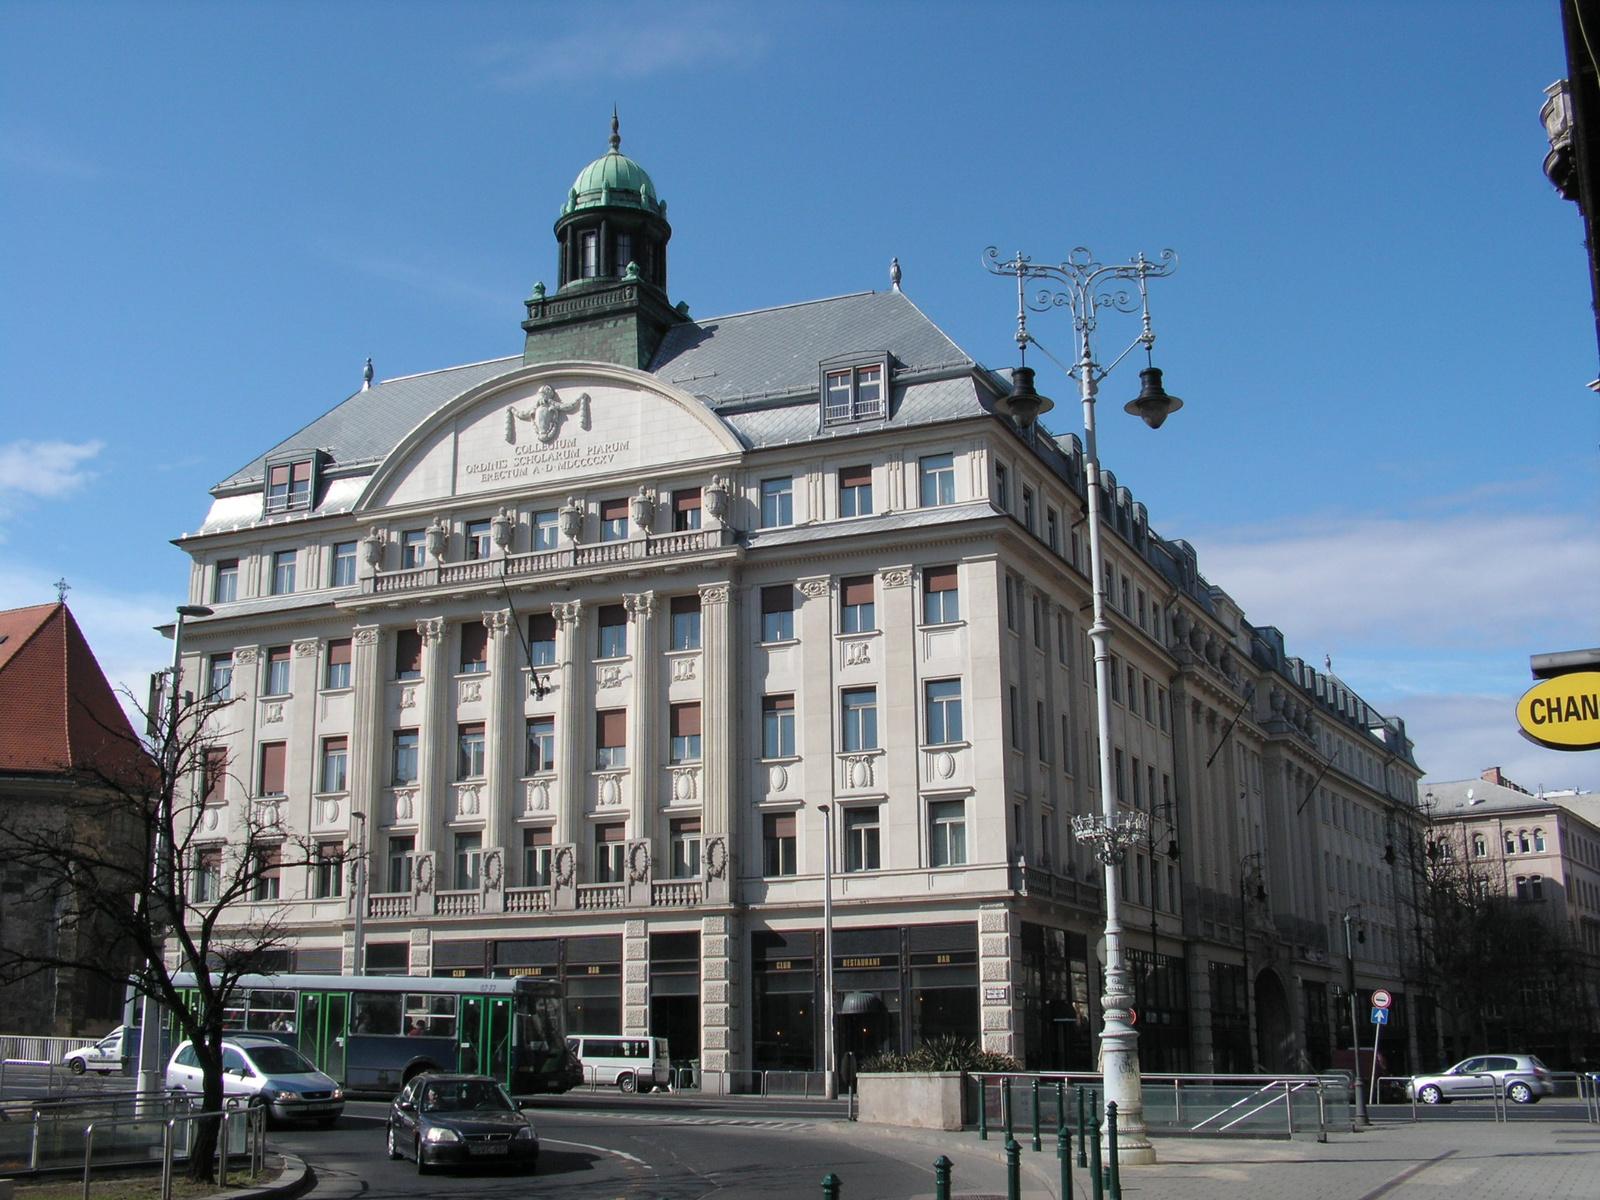 Budapest, a Piarista tömb, SzG3